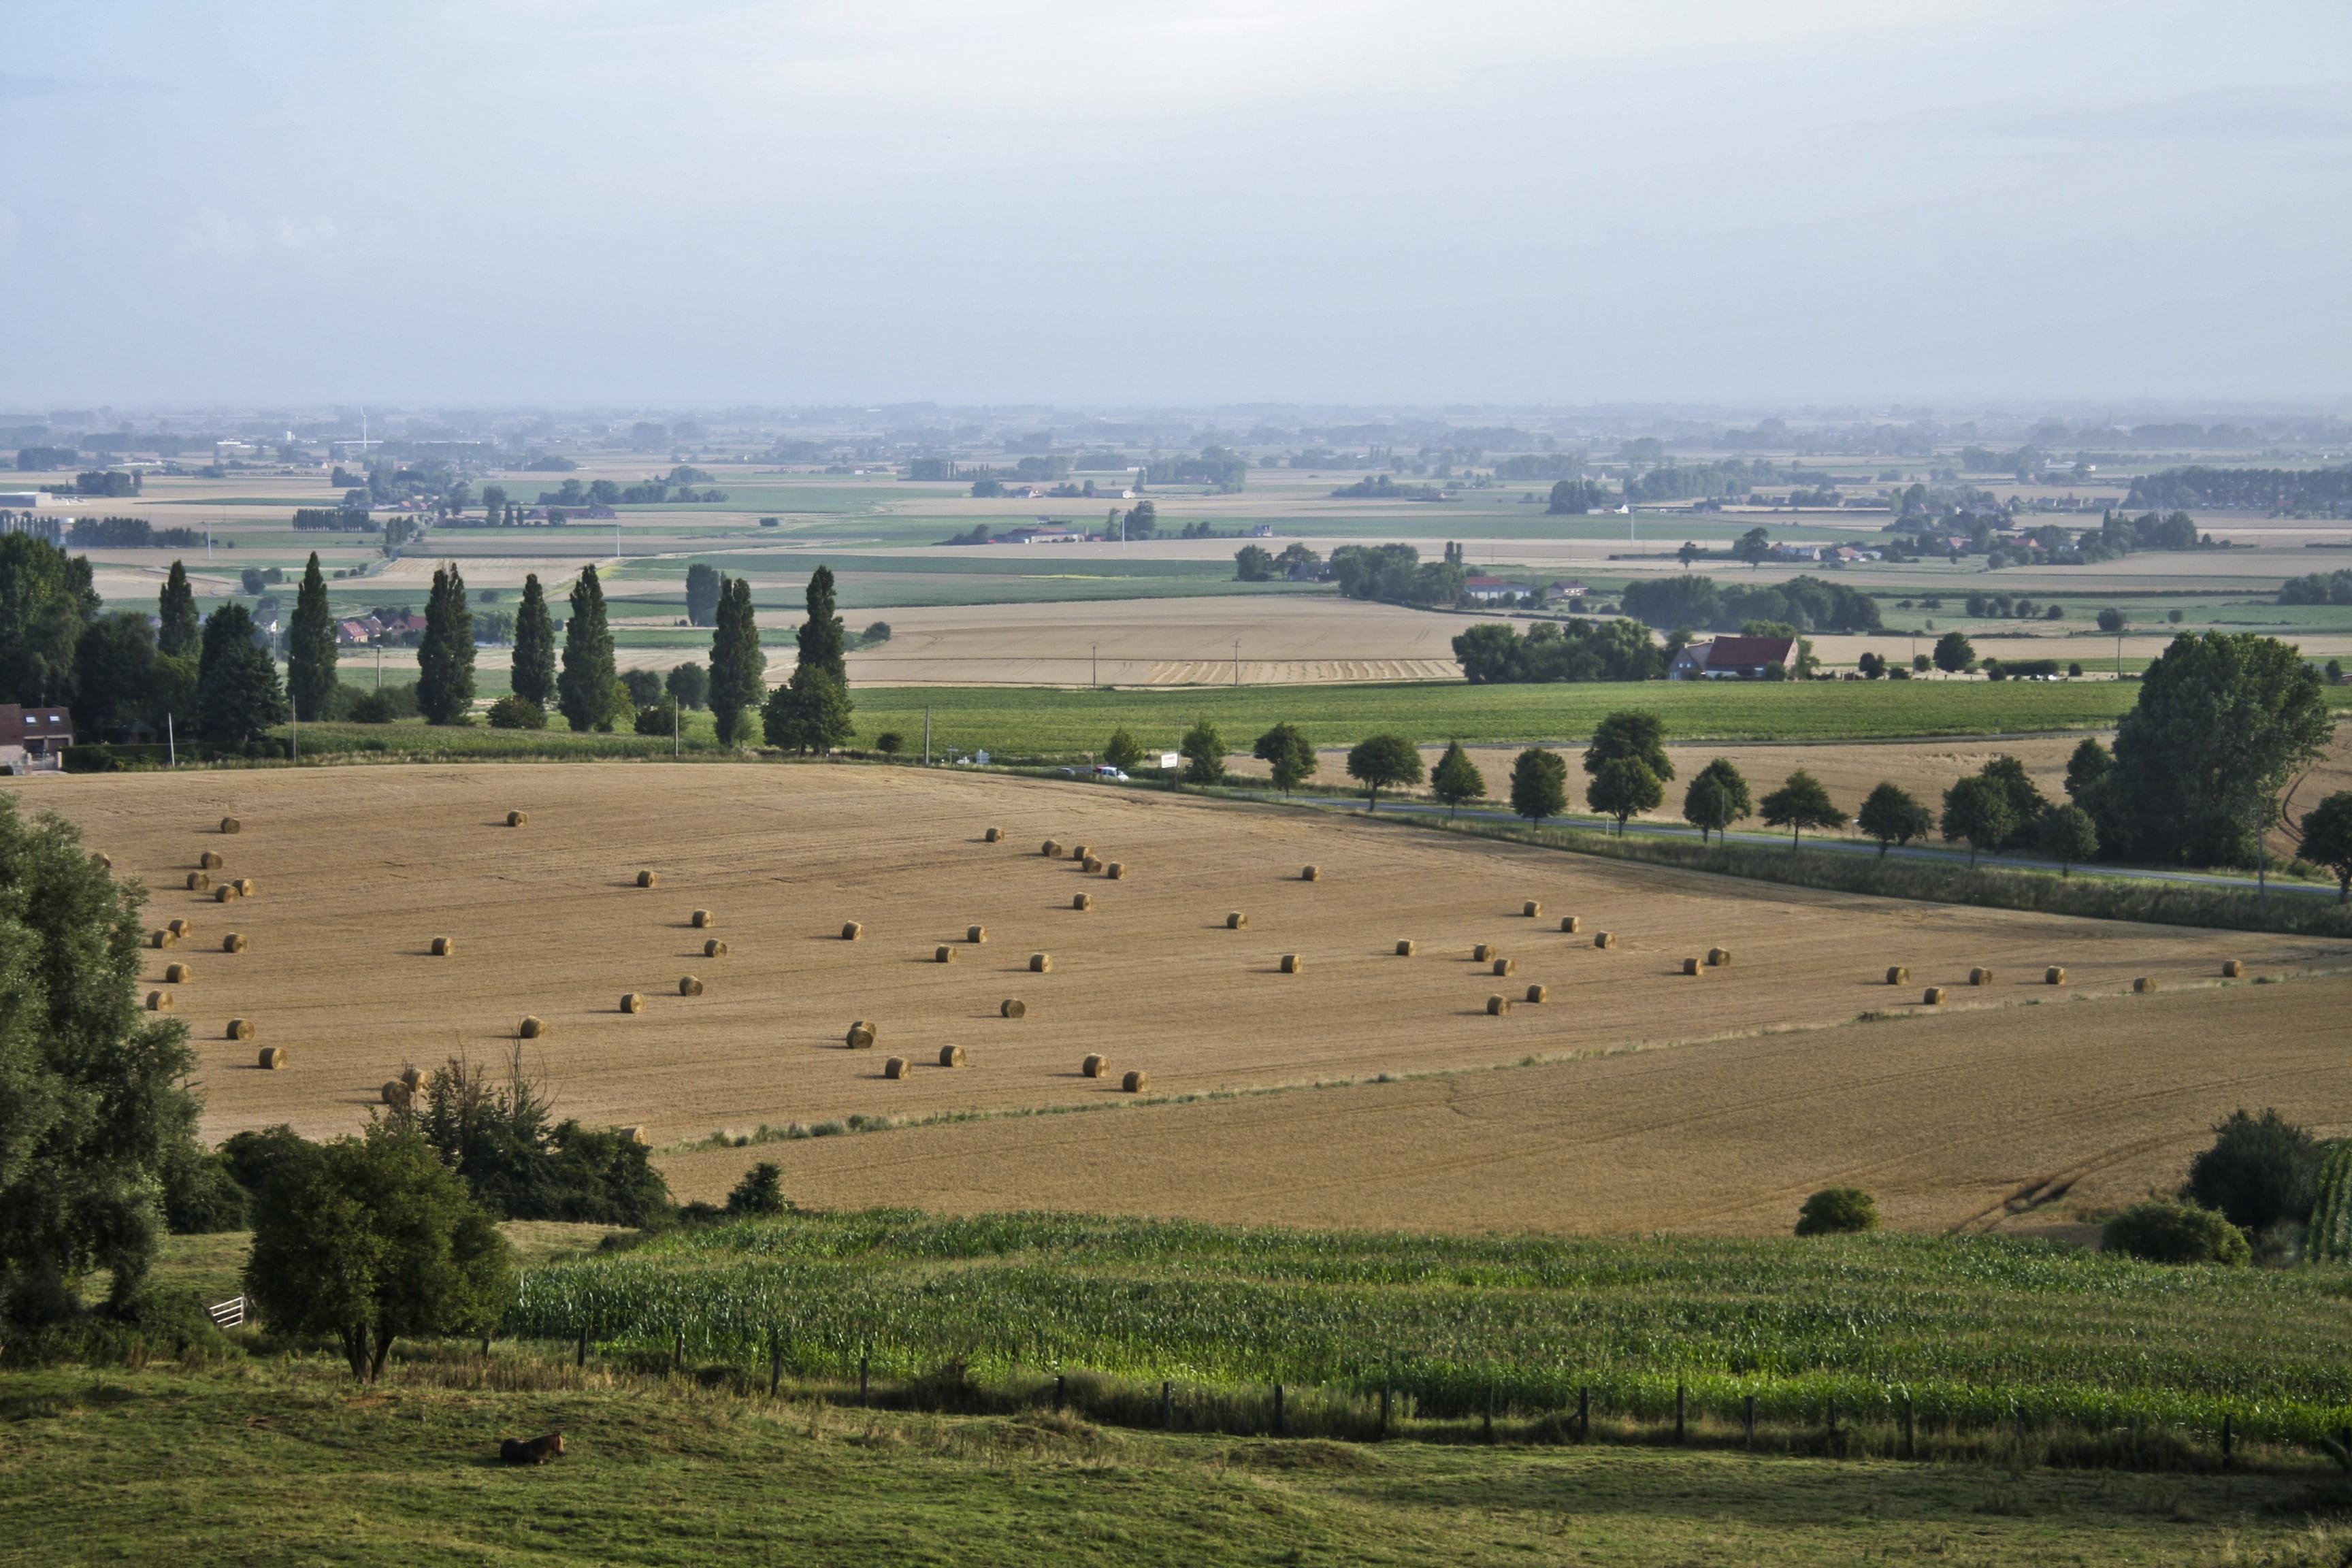 farming-france-french-harvest-fe454f6ea2003bd3dab5e66e03431b9a